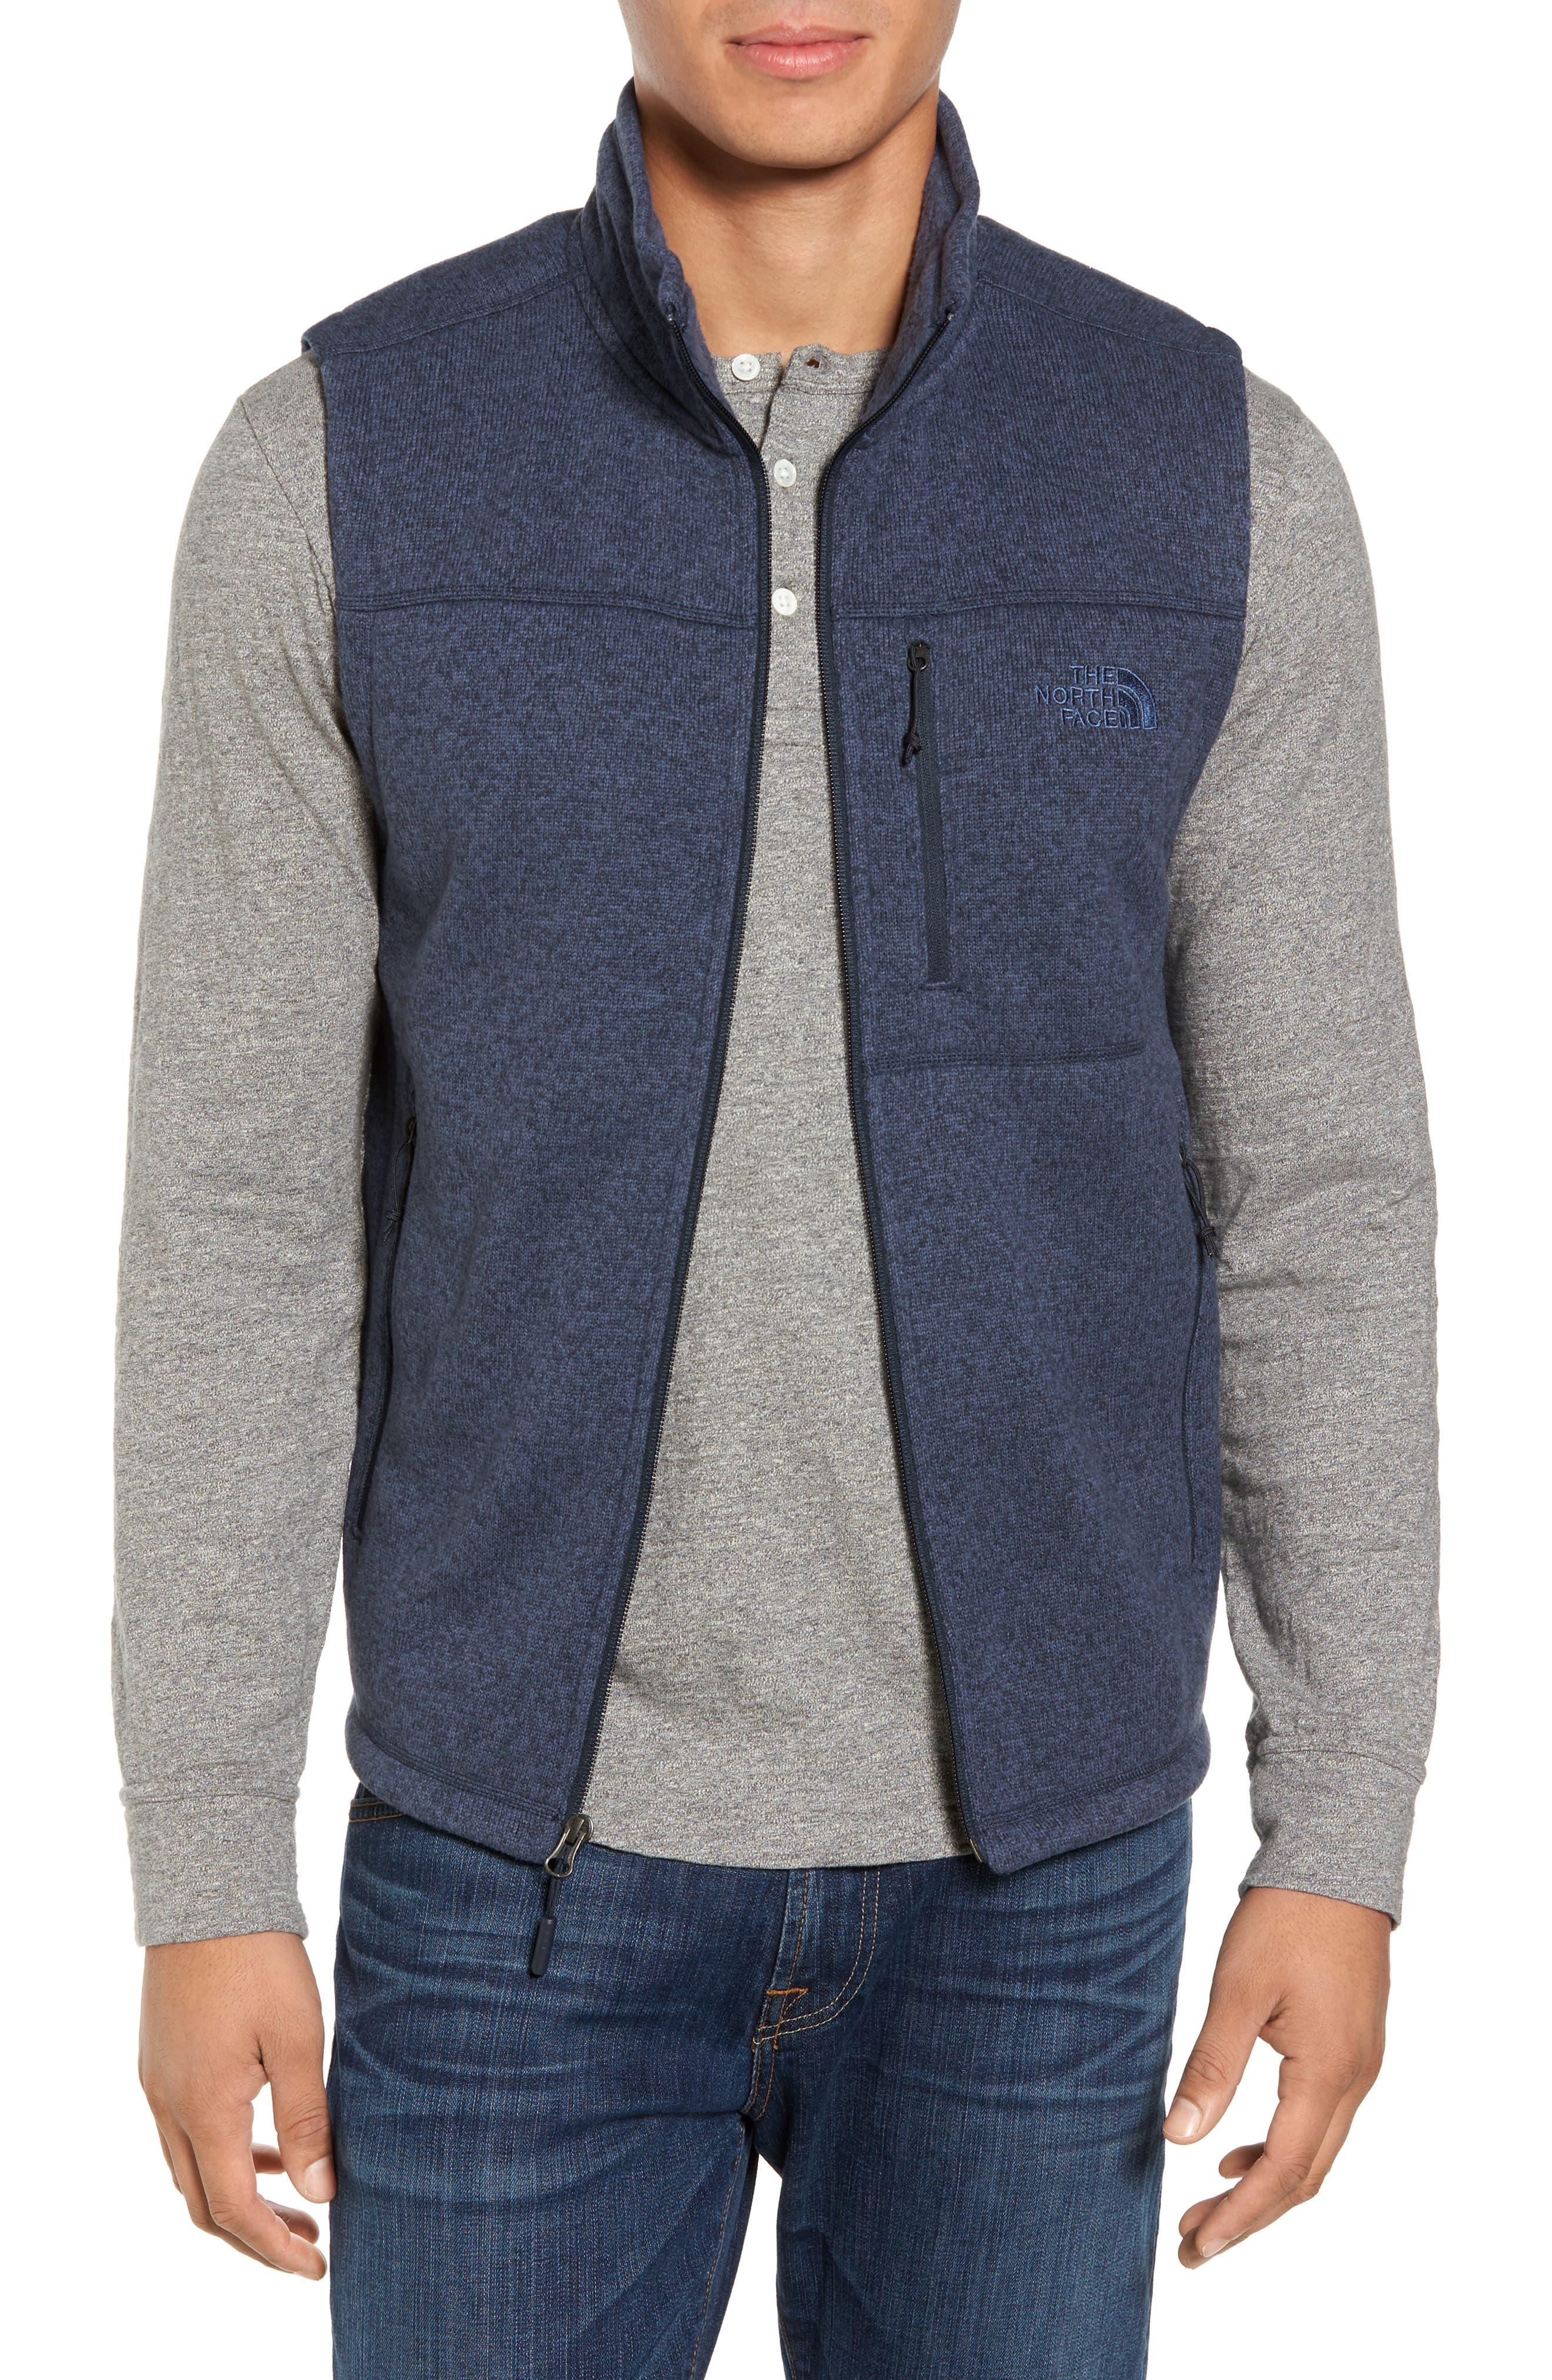 Gordon Lyons Zip Fleece Vest,                             Main thumbnail 5, color,